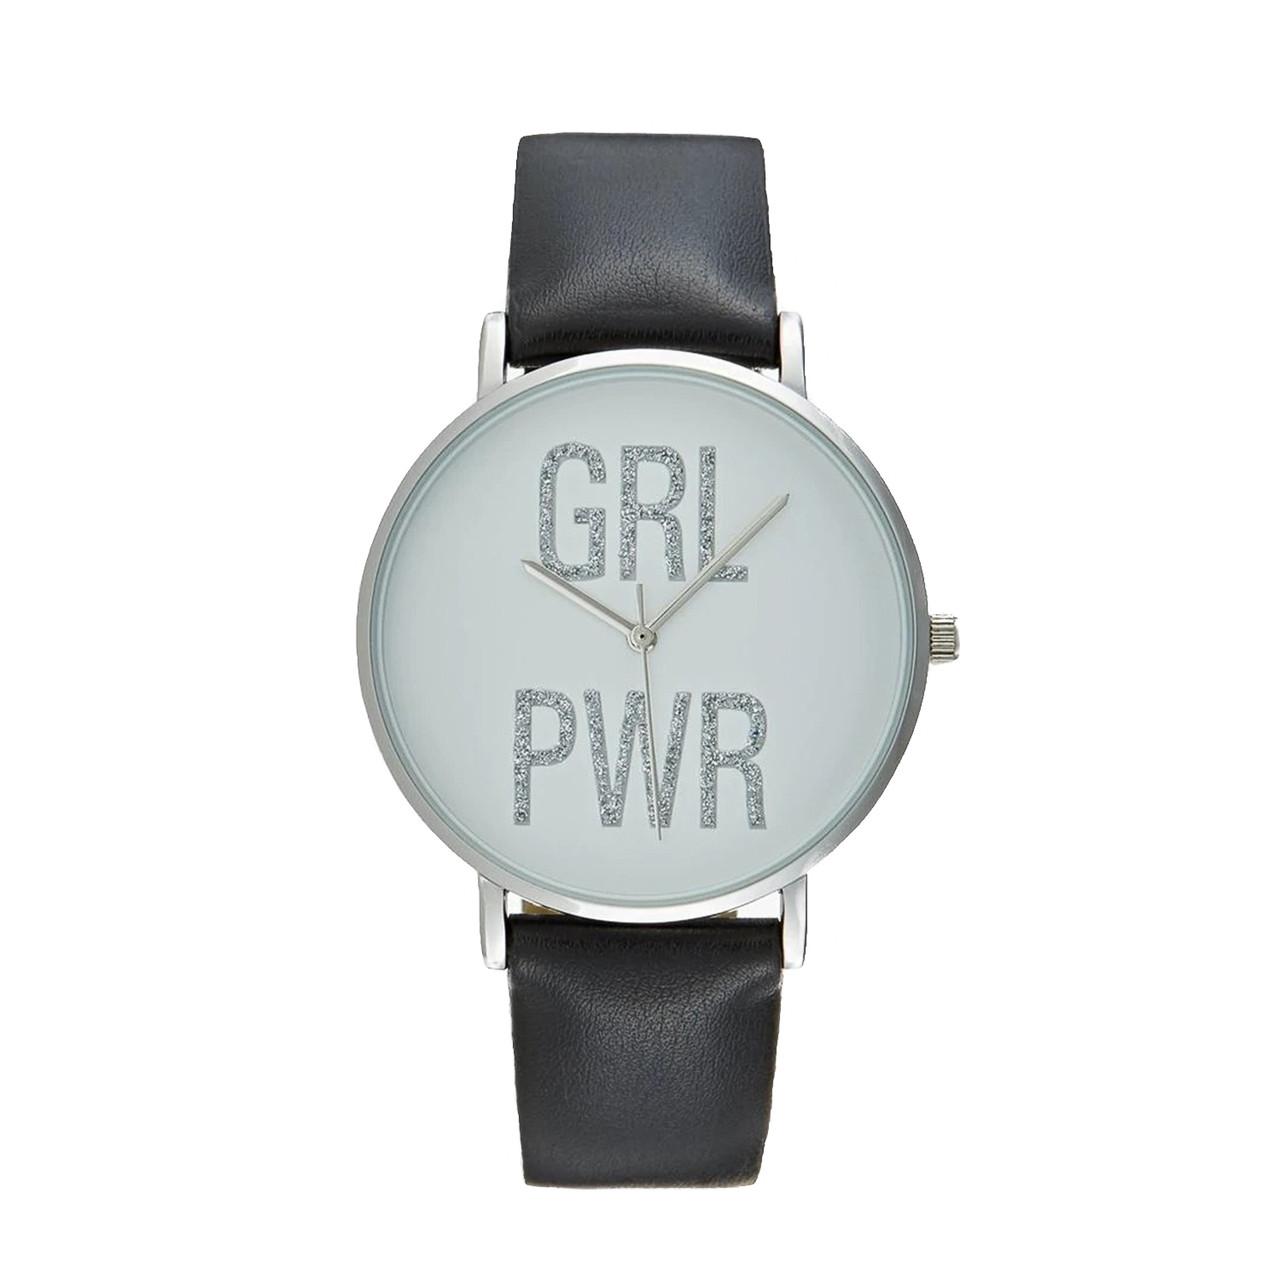 Жіночий годинник New Look Girl Power Dial